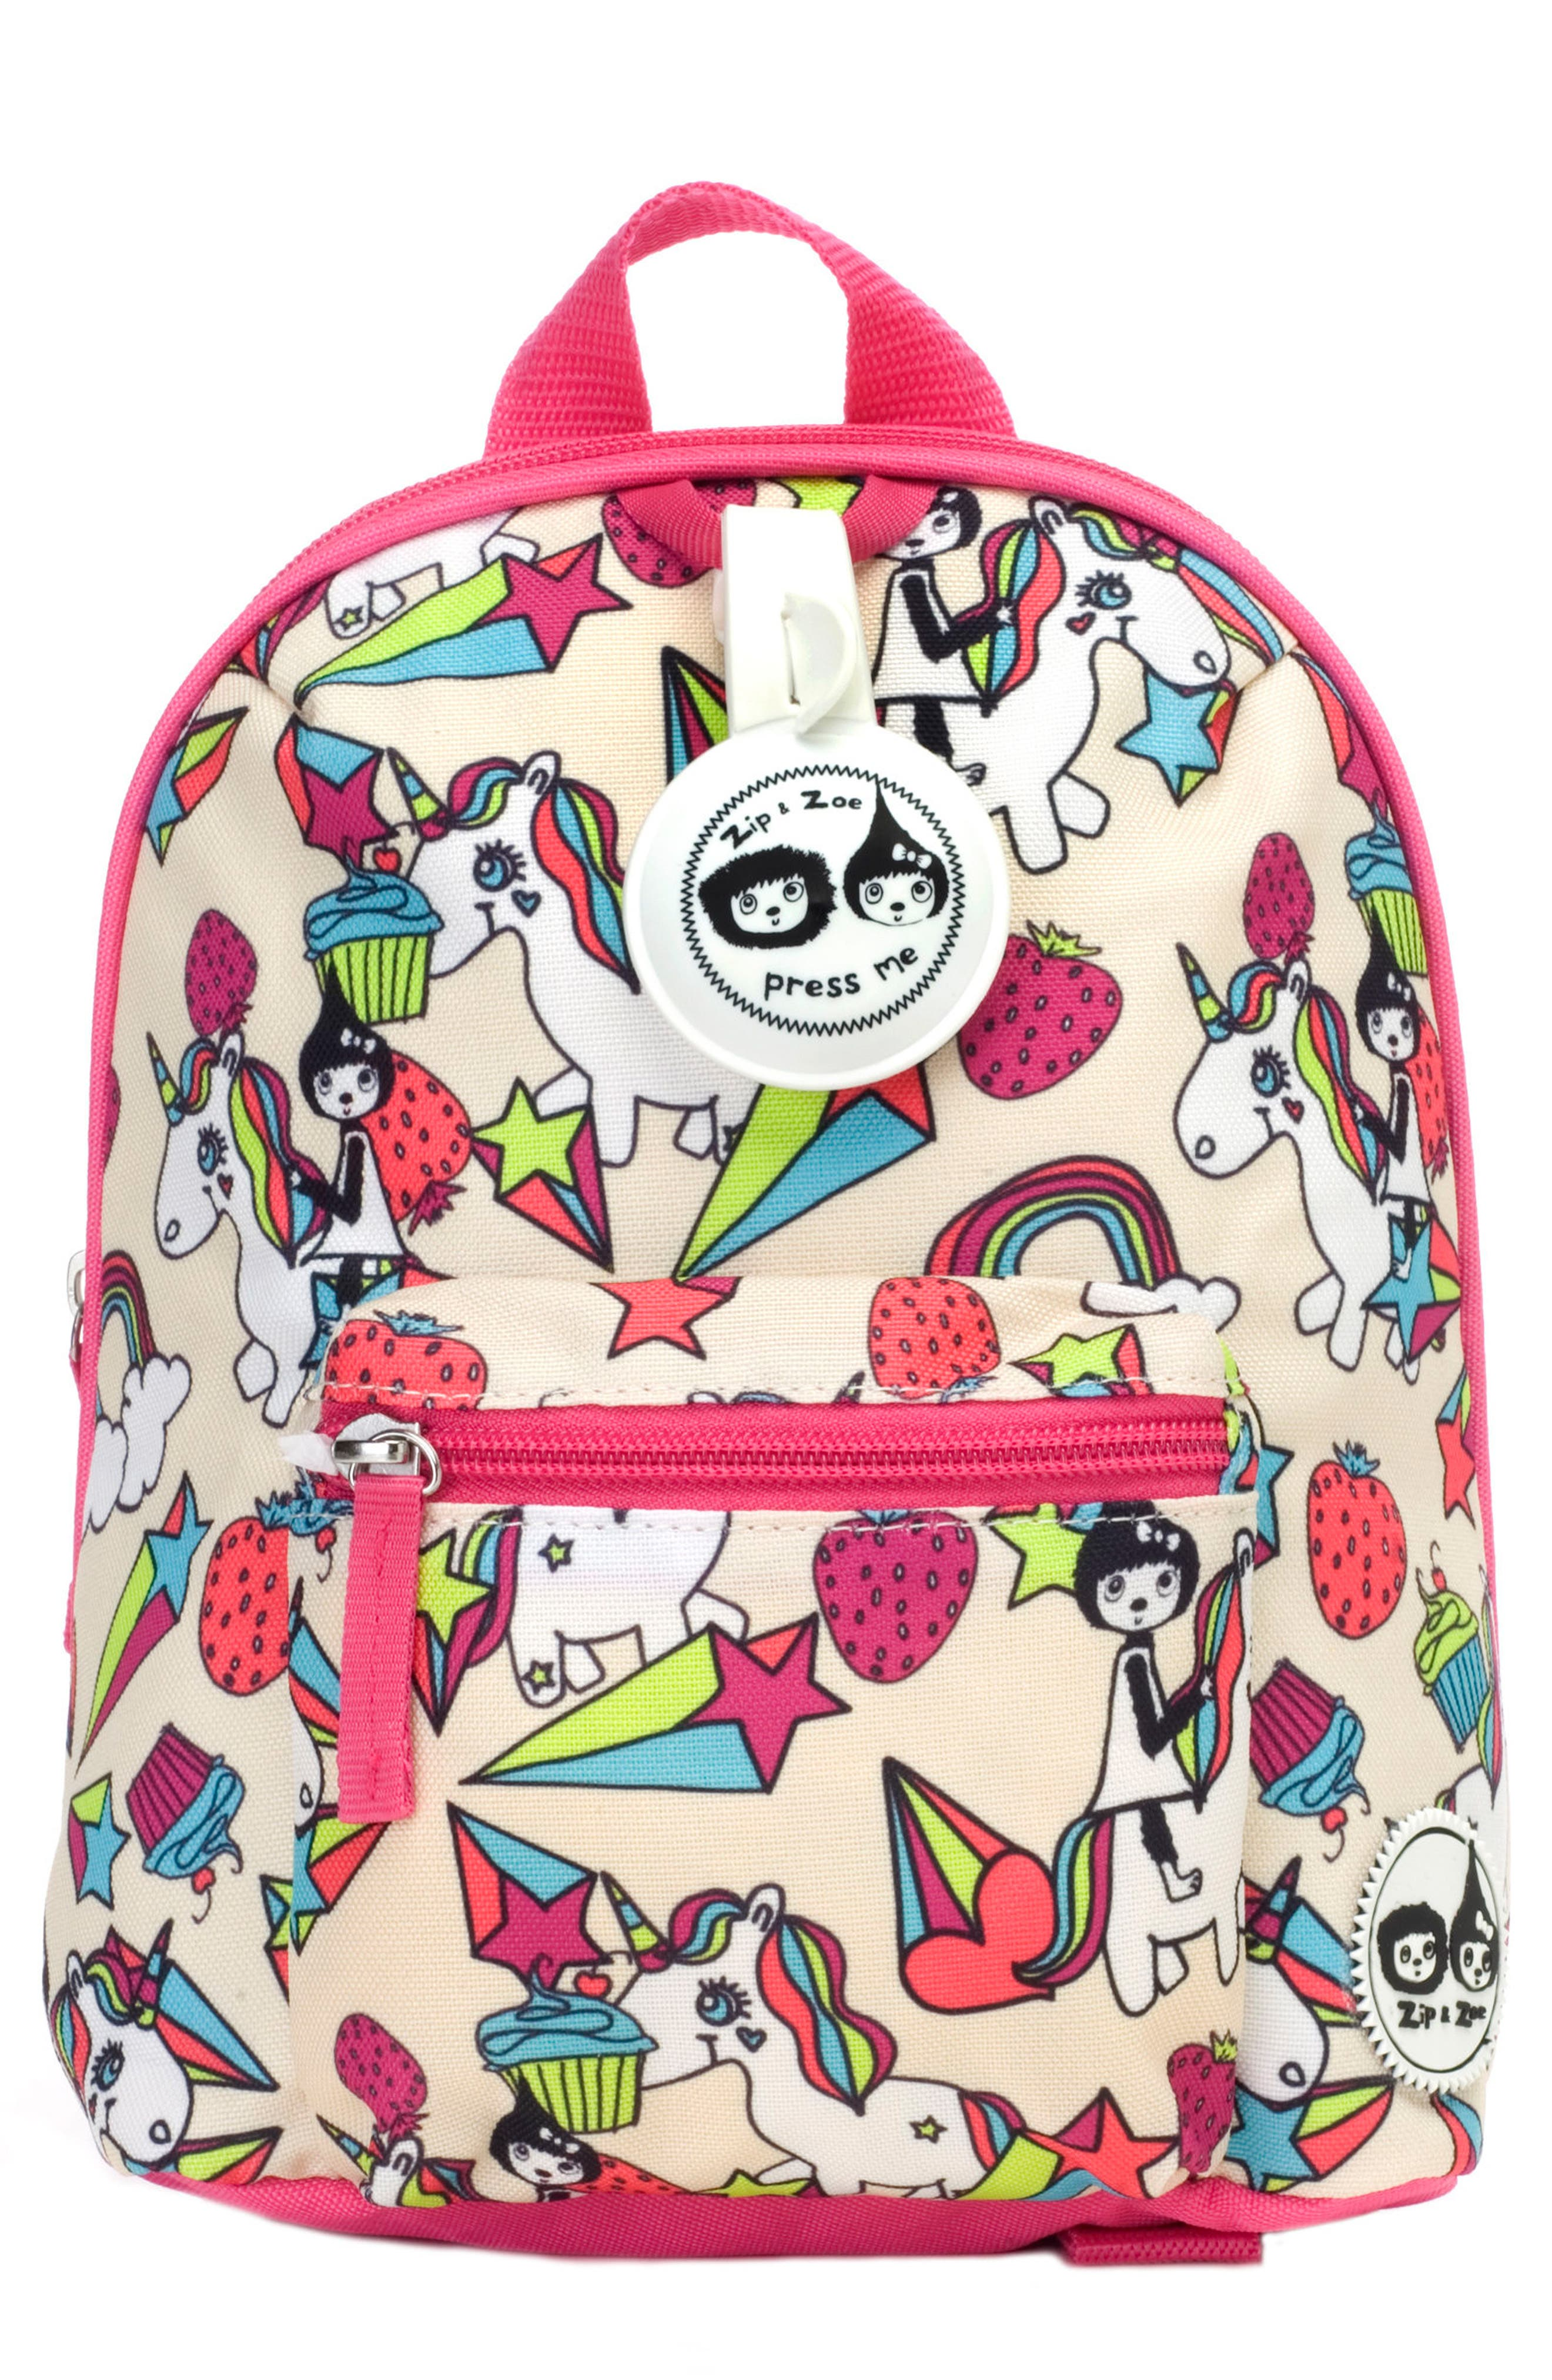 BABYMEL Zip & Zoe Unicorn Mini Backpack, Main, color, UNICORN